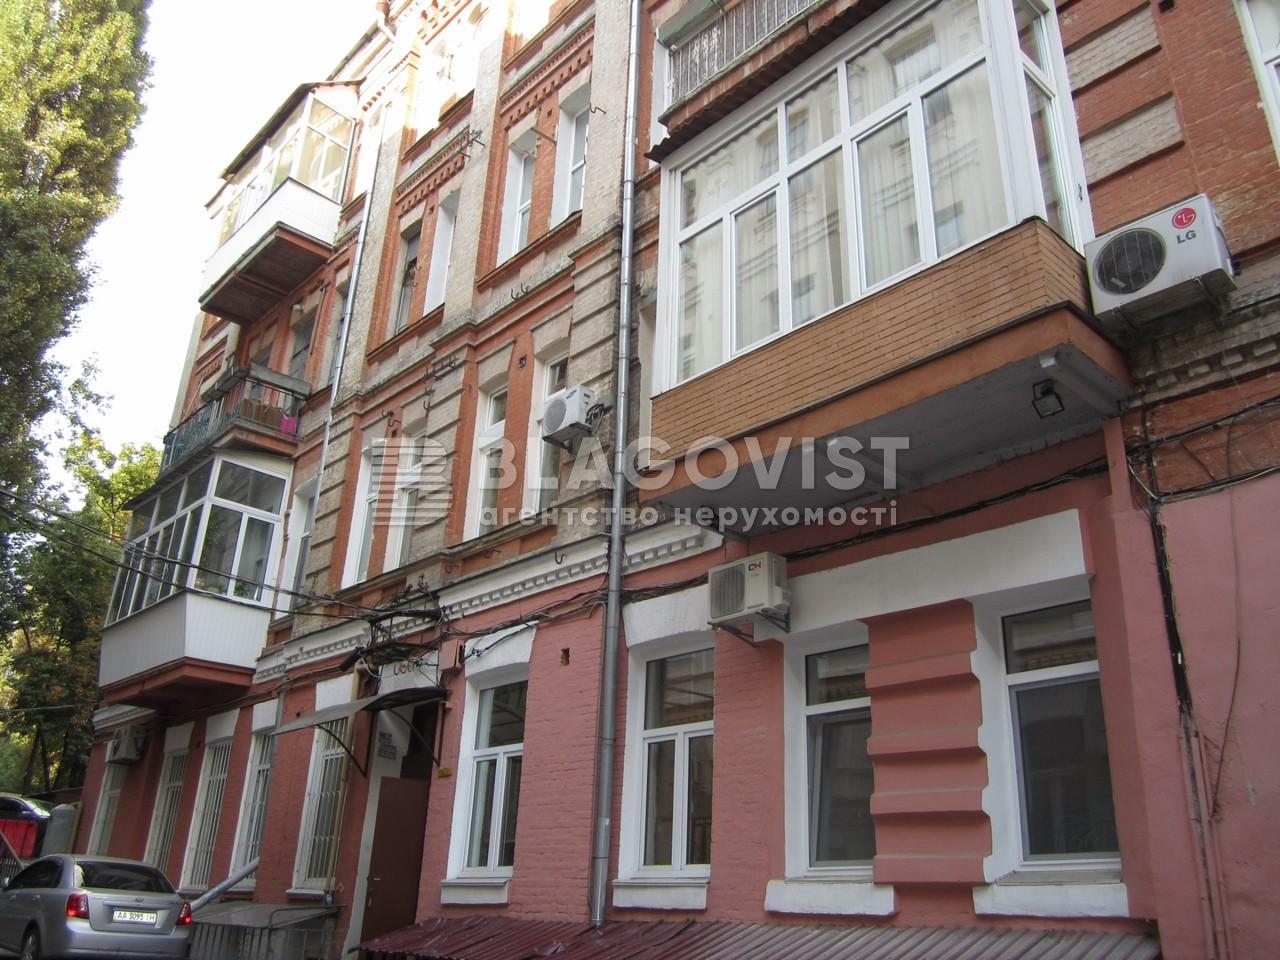 Квартира E-36986, Антоновича (Горького), 23б, Киев - Фото 1